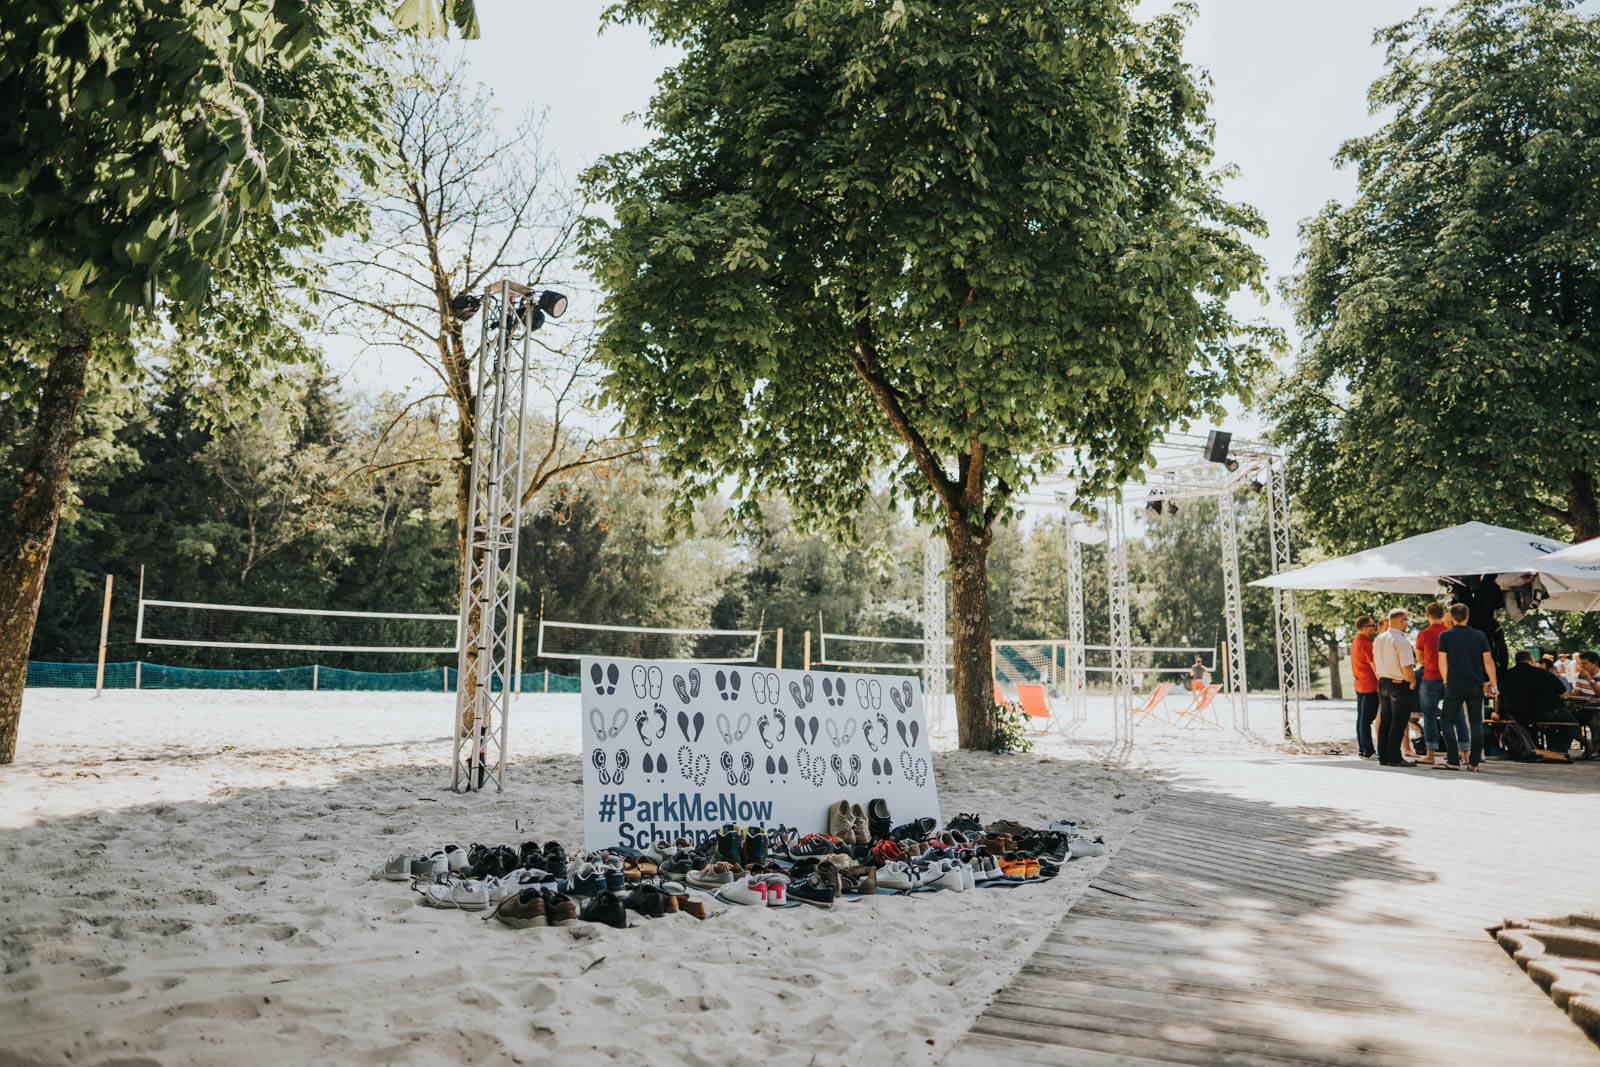 gavesi-eventcatering-im-munich-beach-resort-25072018-60